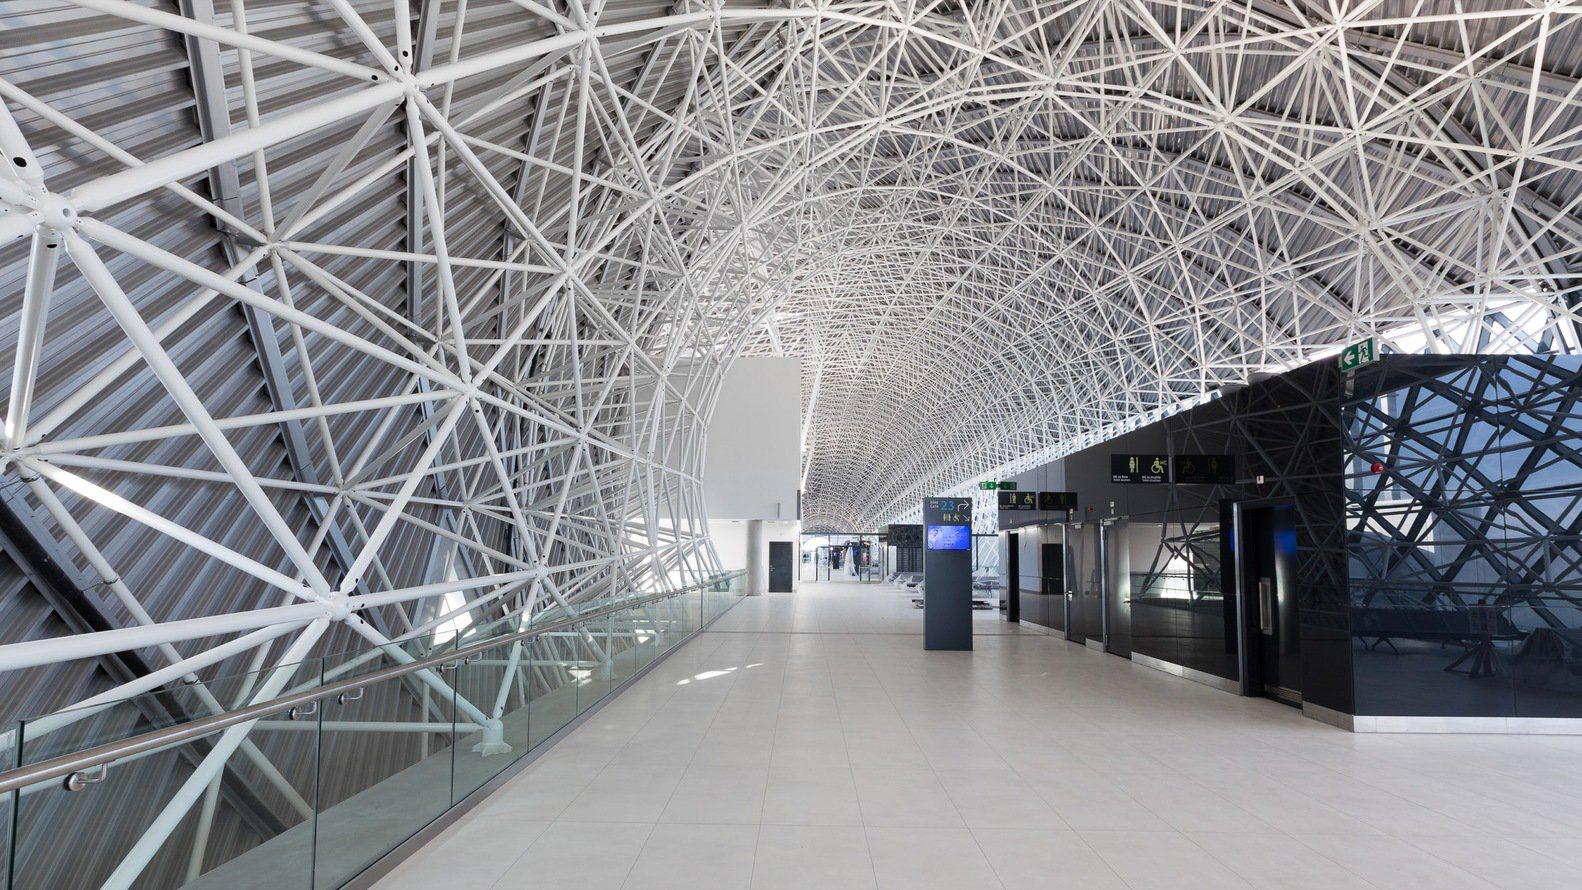 Pin By Arkitekt Deconstructive On Architecture Architecture Landmark Zagreb Architecture